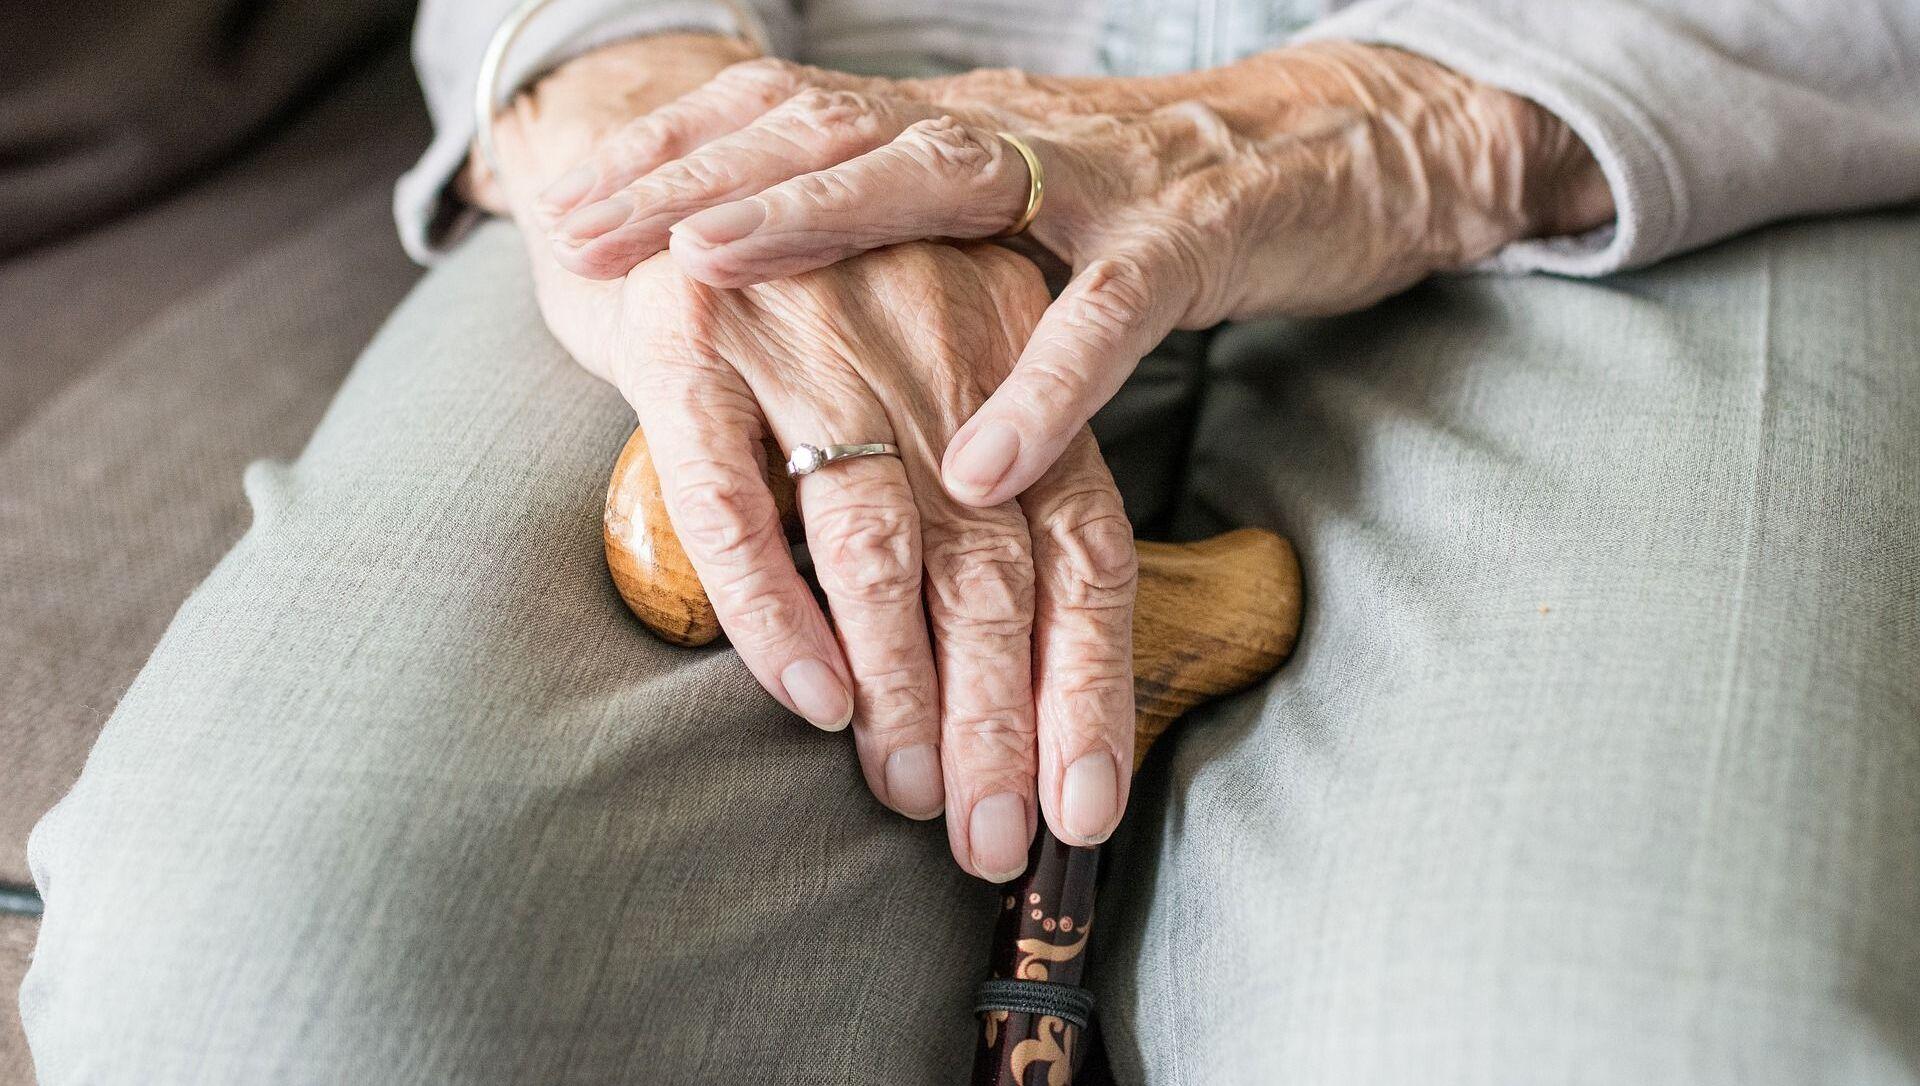 Une dame âgée (Image d'illustration) - Sputnik France, 1920, 21.08.2021